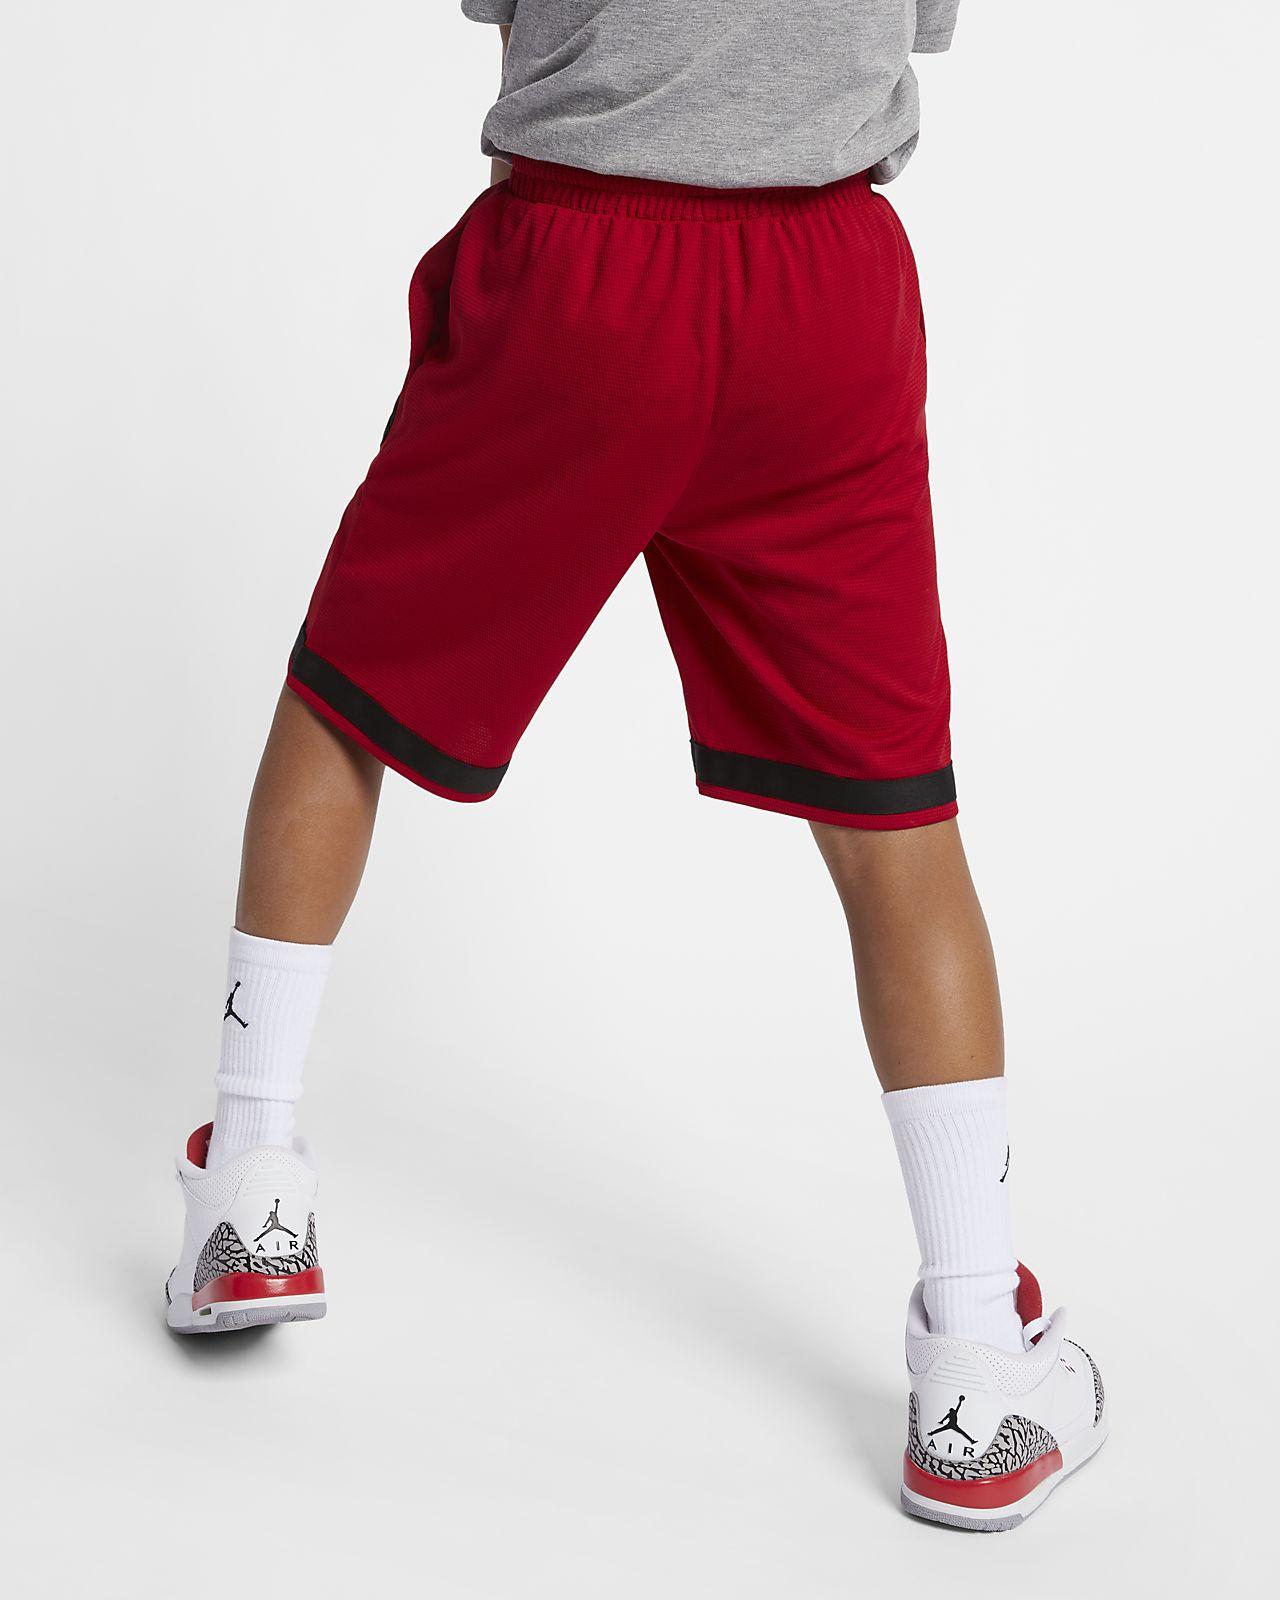 4823fa5623f8 Jordan Dri-FIT Diamond Big Kids  (Boys ) Shorts. Nike.com